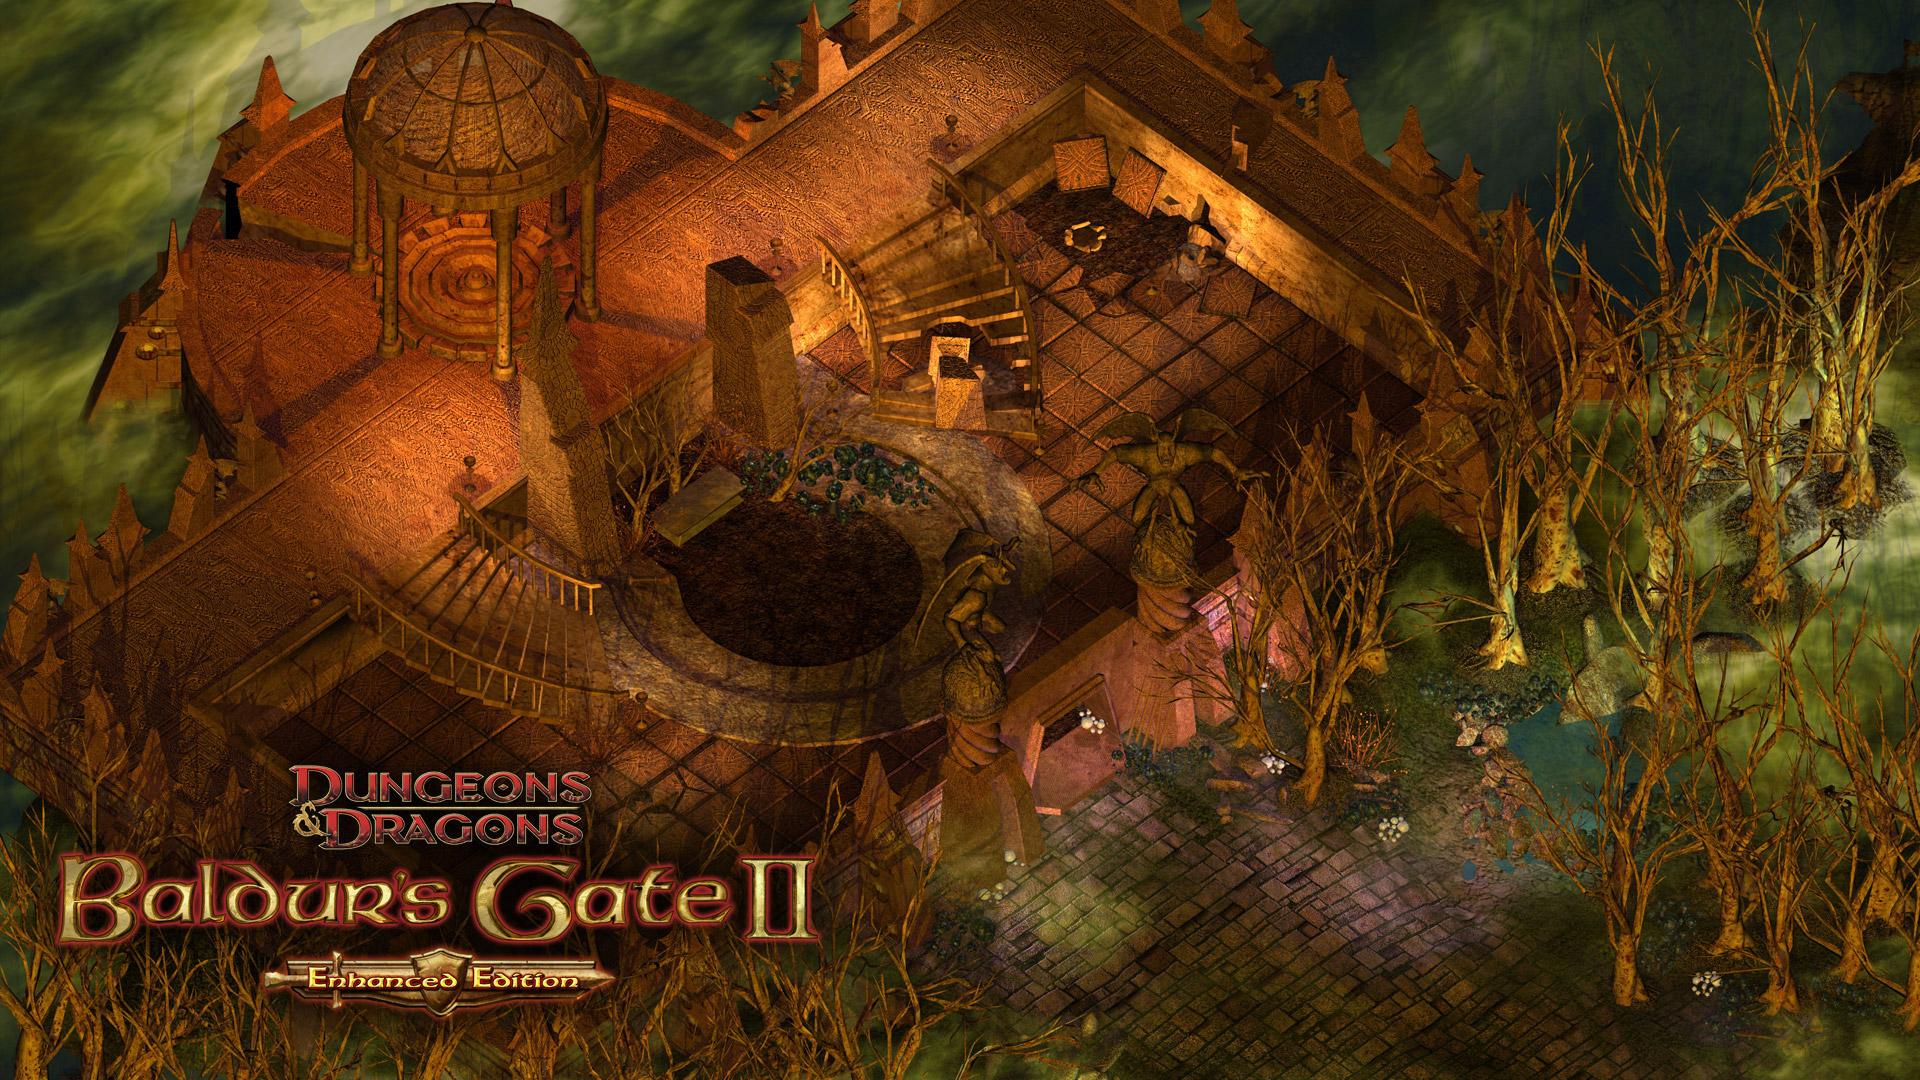 Free Baldur's Gate II Wallpaper in 1920x1080